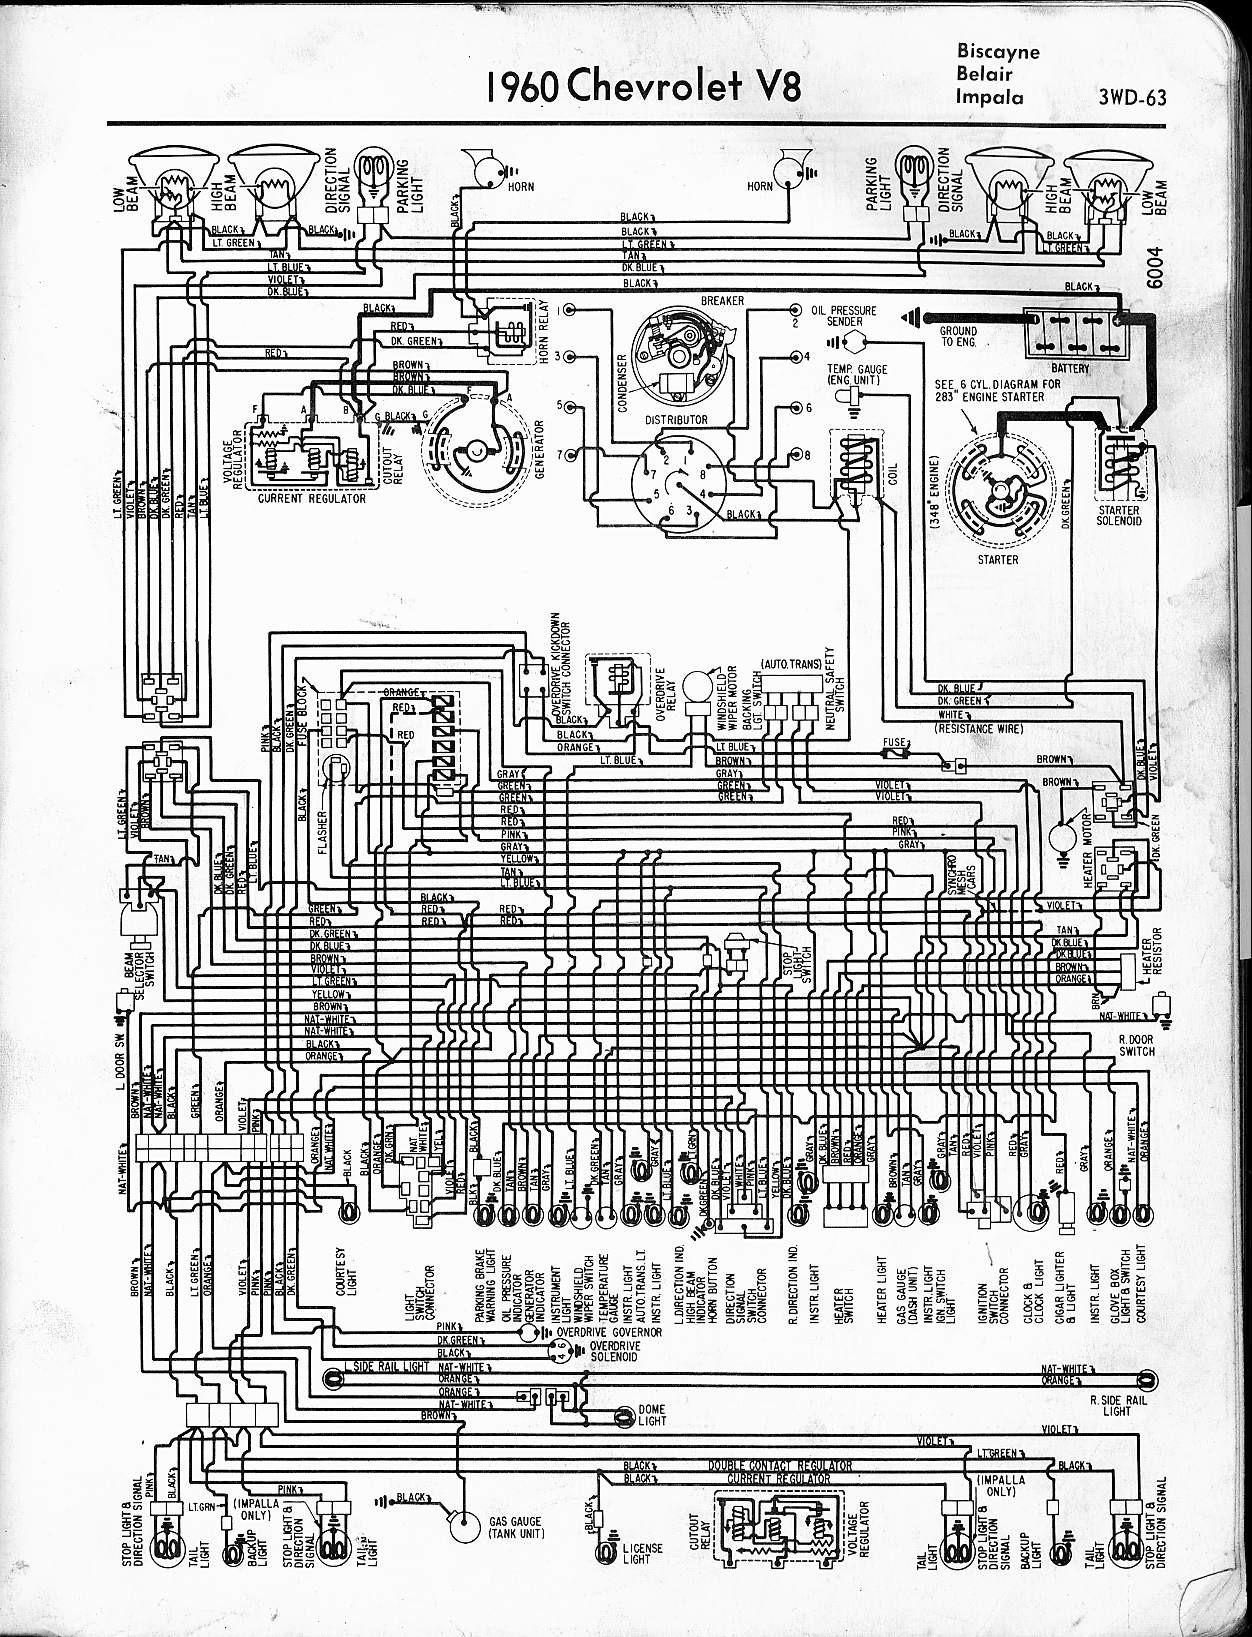 2005 Chevy Malibu Engine Diagram 57 65 Chevy Wiring Diagrams Of 2005 Chevy  Malibu Engine Diagram